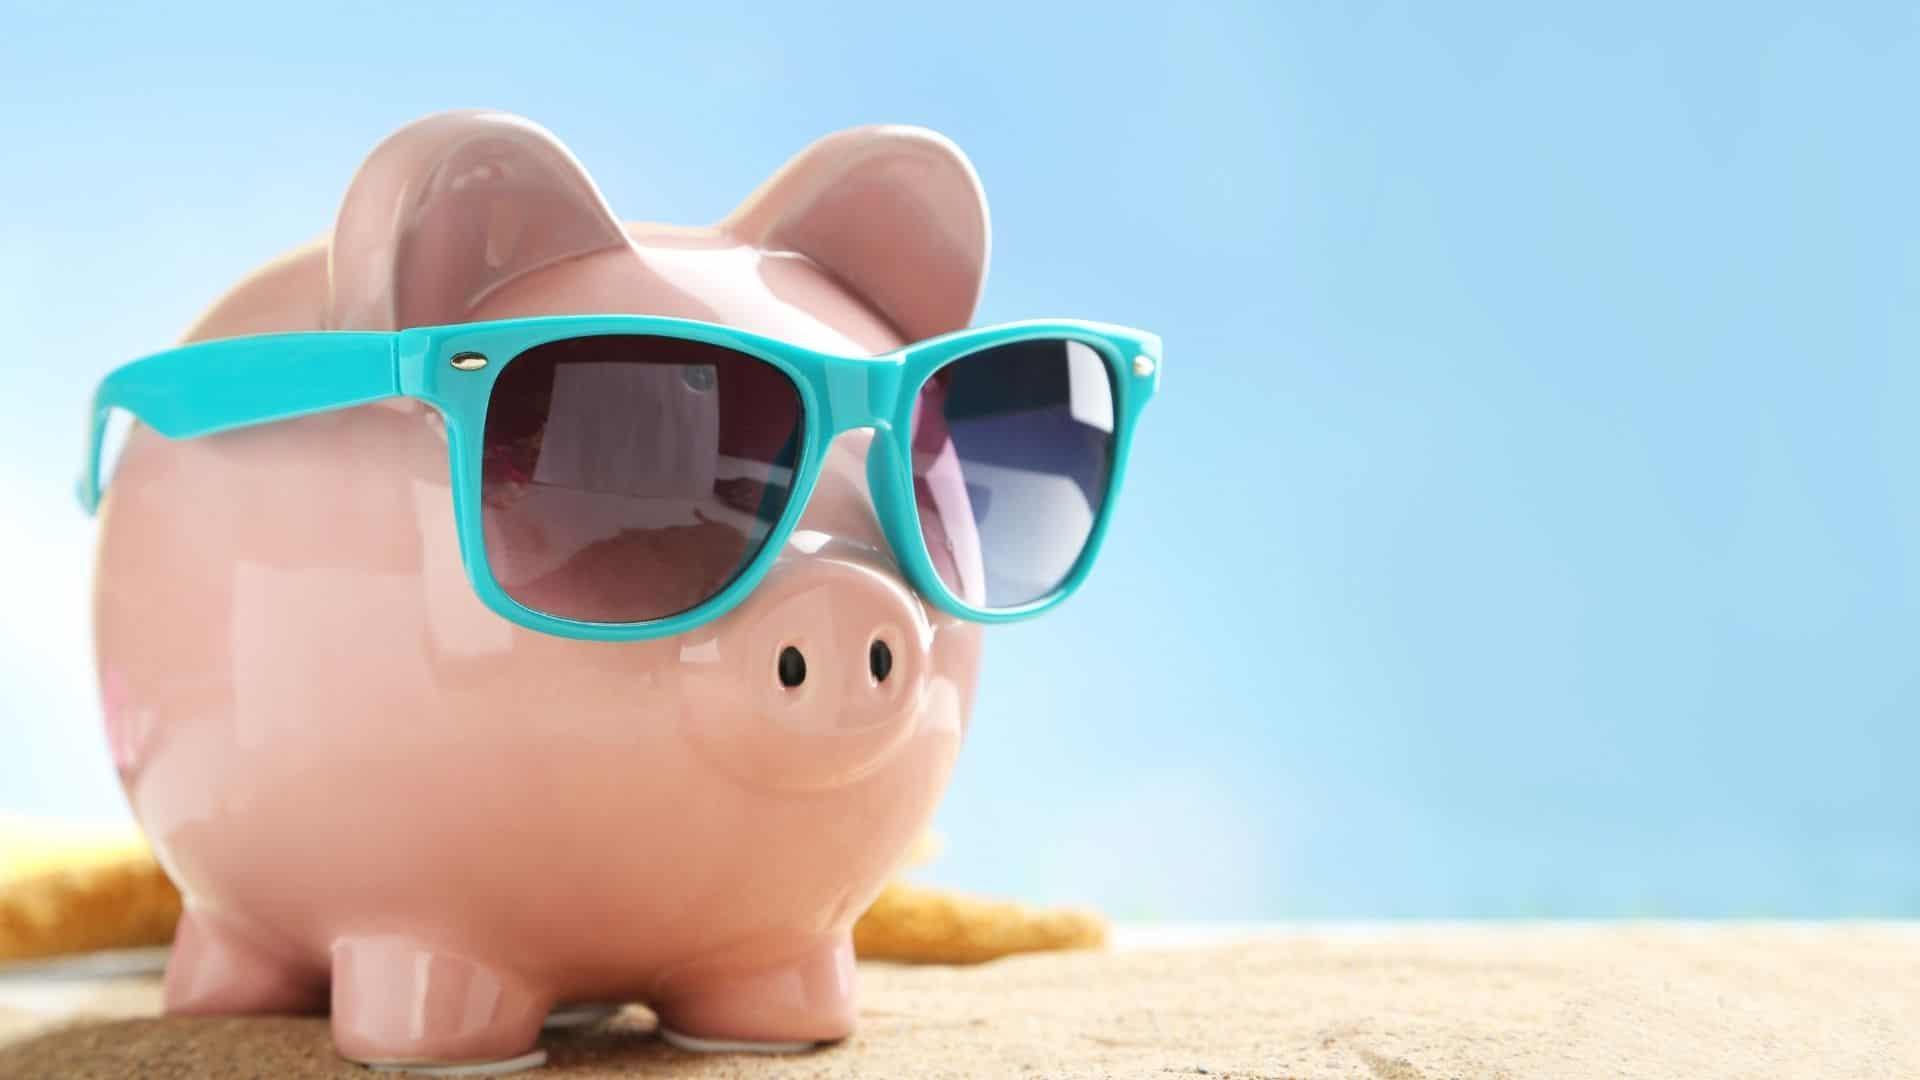 piggy bank with blue sunglasses